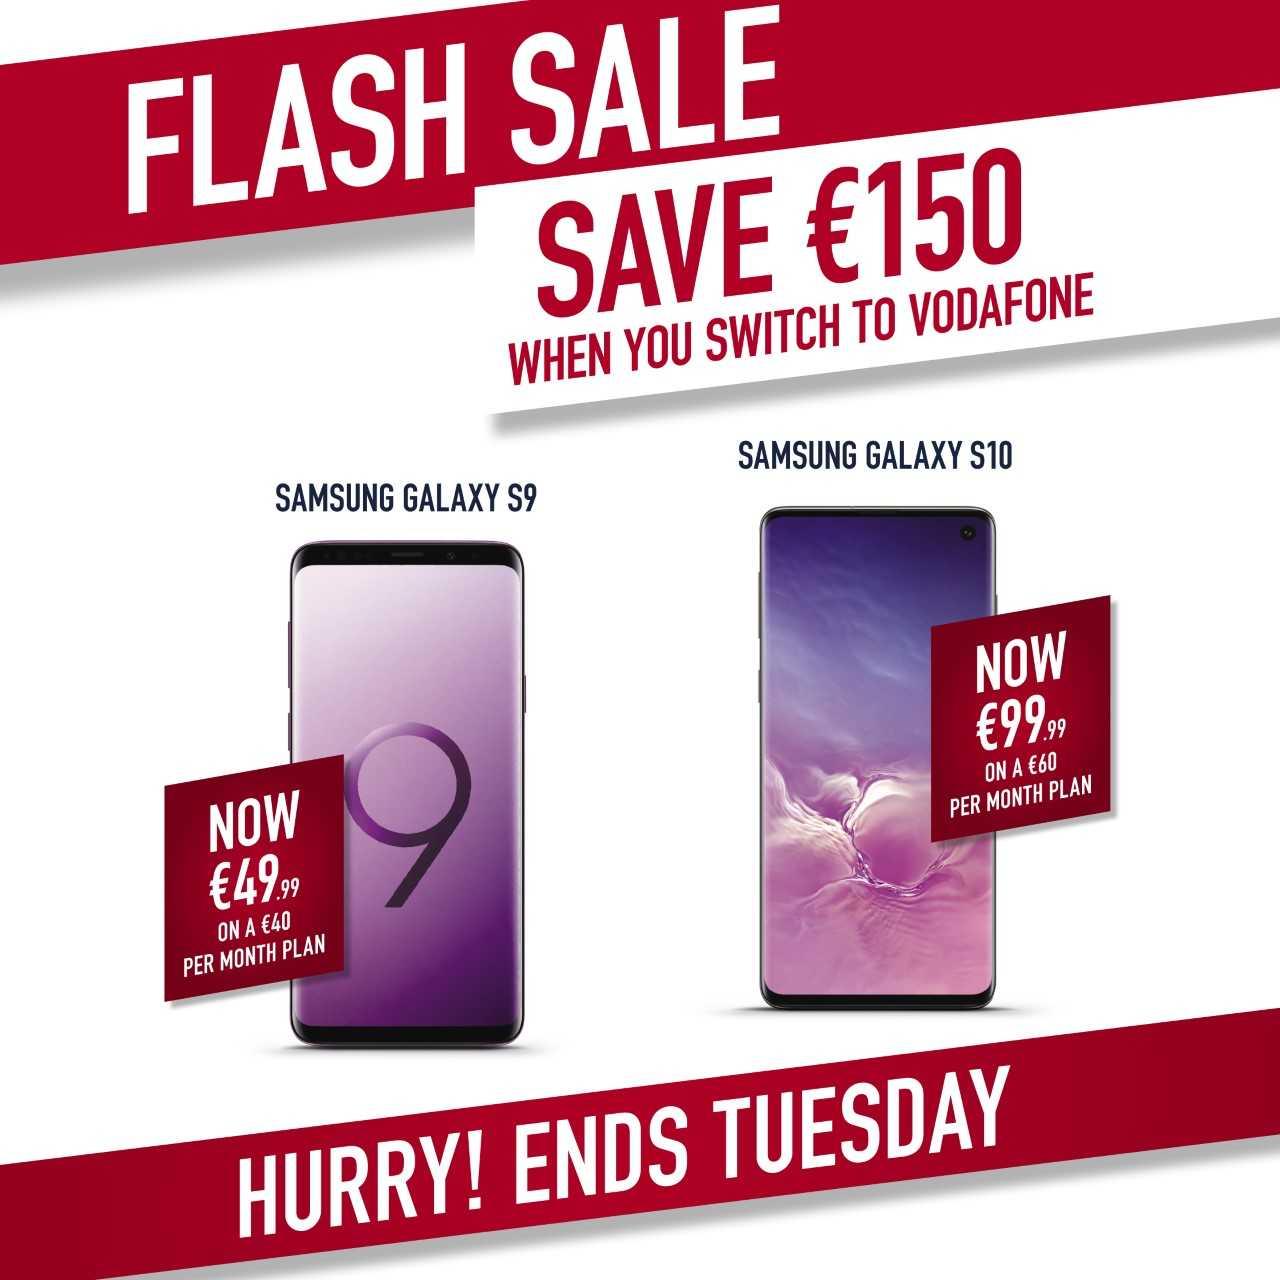 Carphone warehouse flash sale